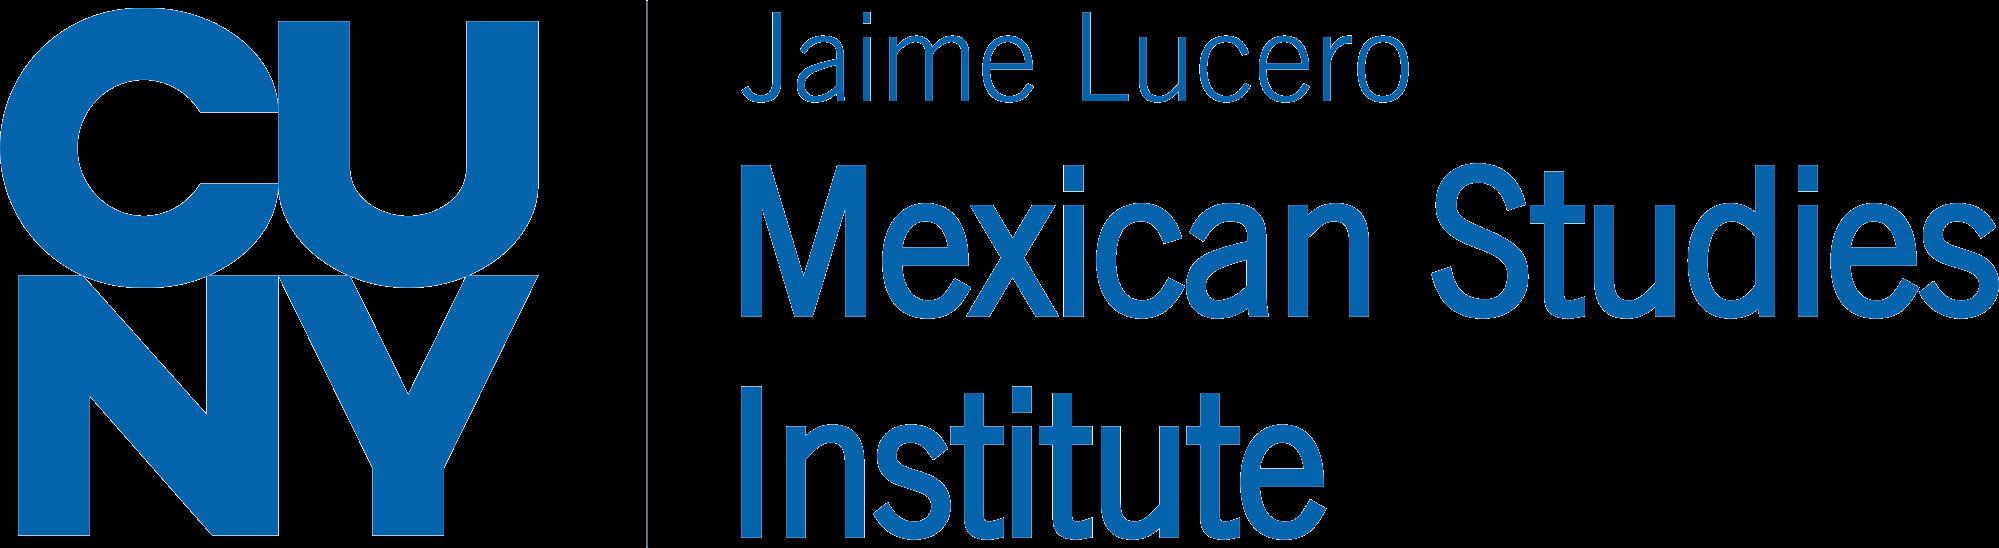 CUNY Mexican Studies Institute - Lehman College